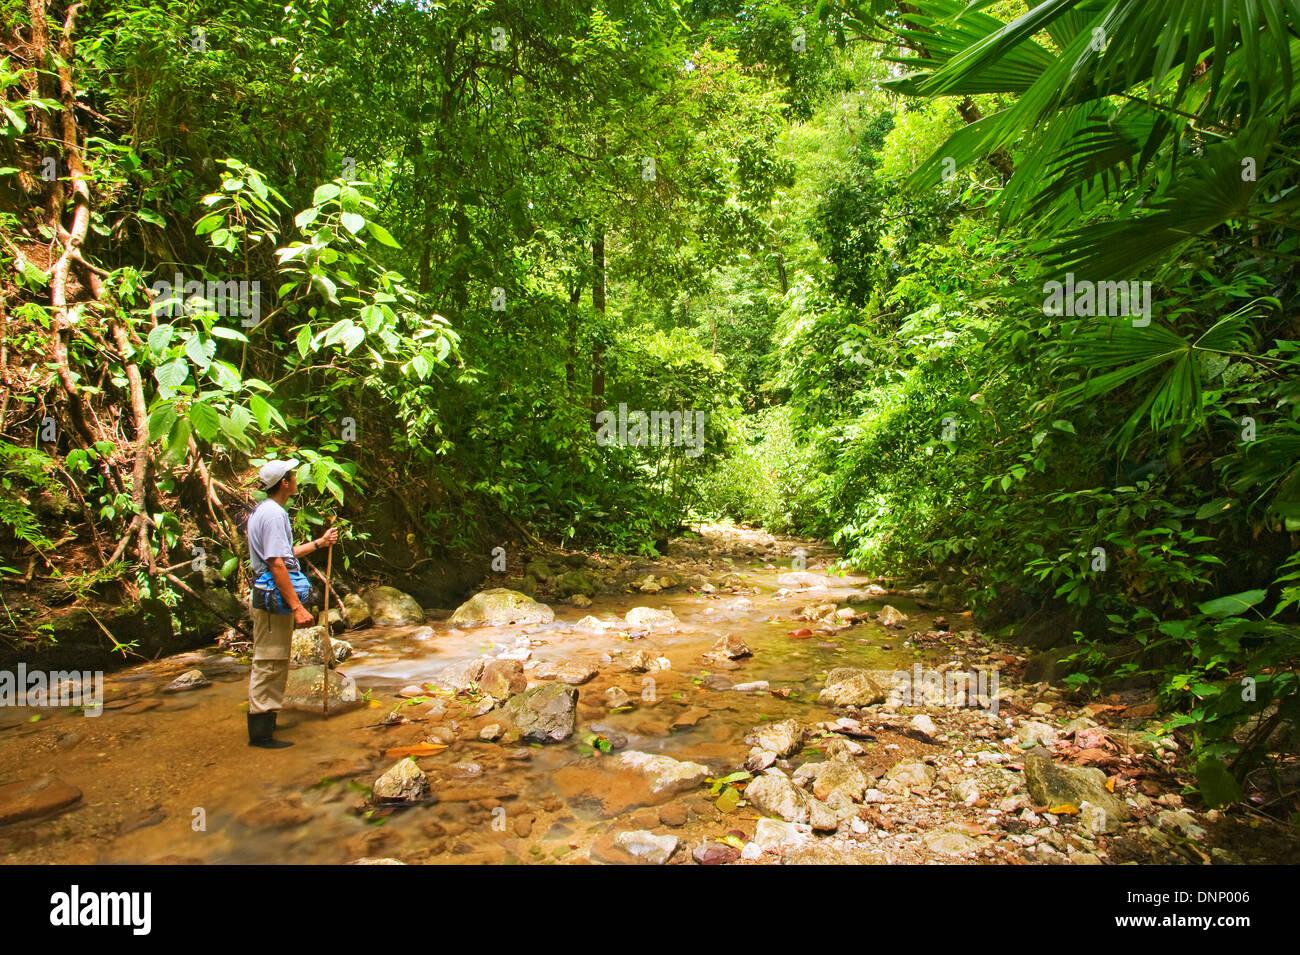 A river in Costa Rica's Osa Peninsula - Stock Image